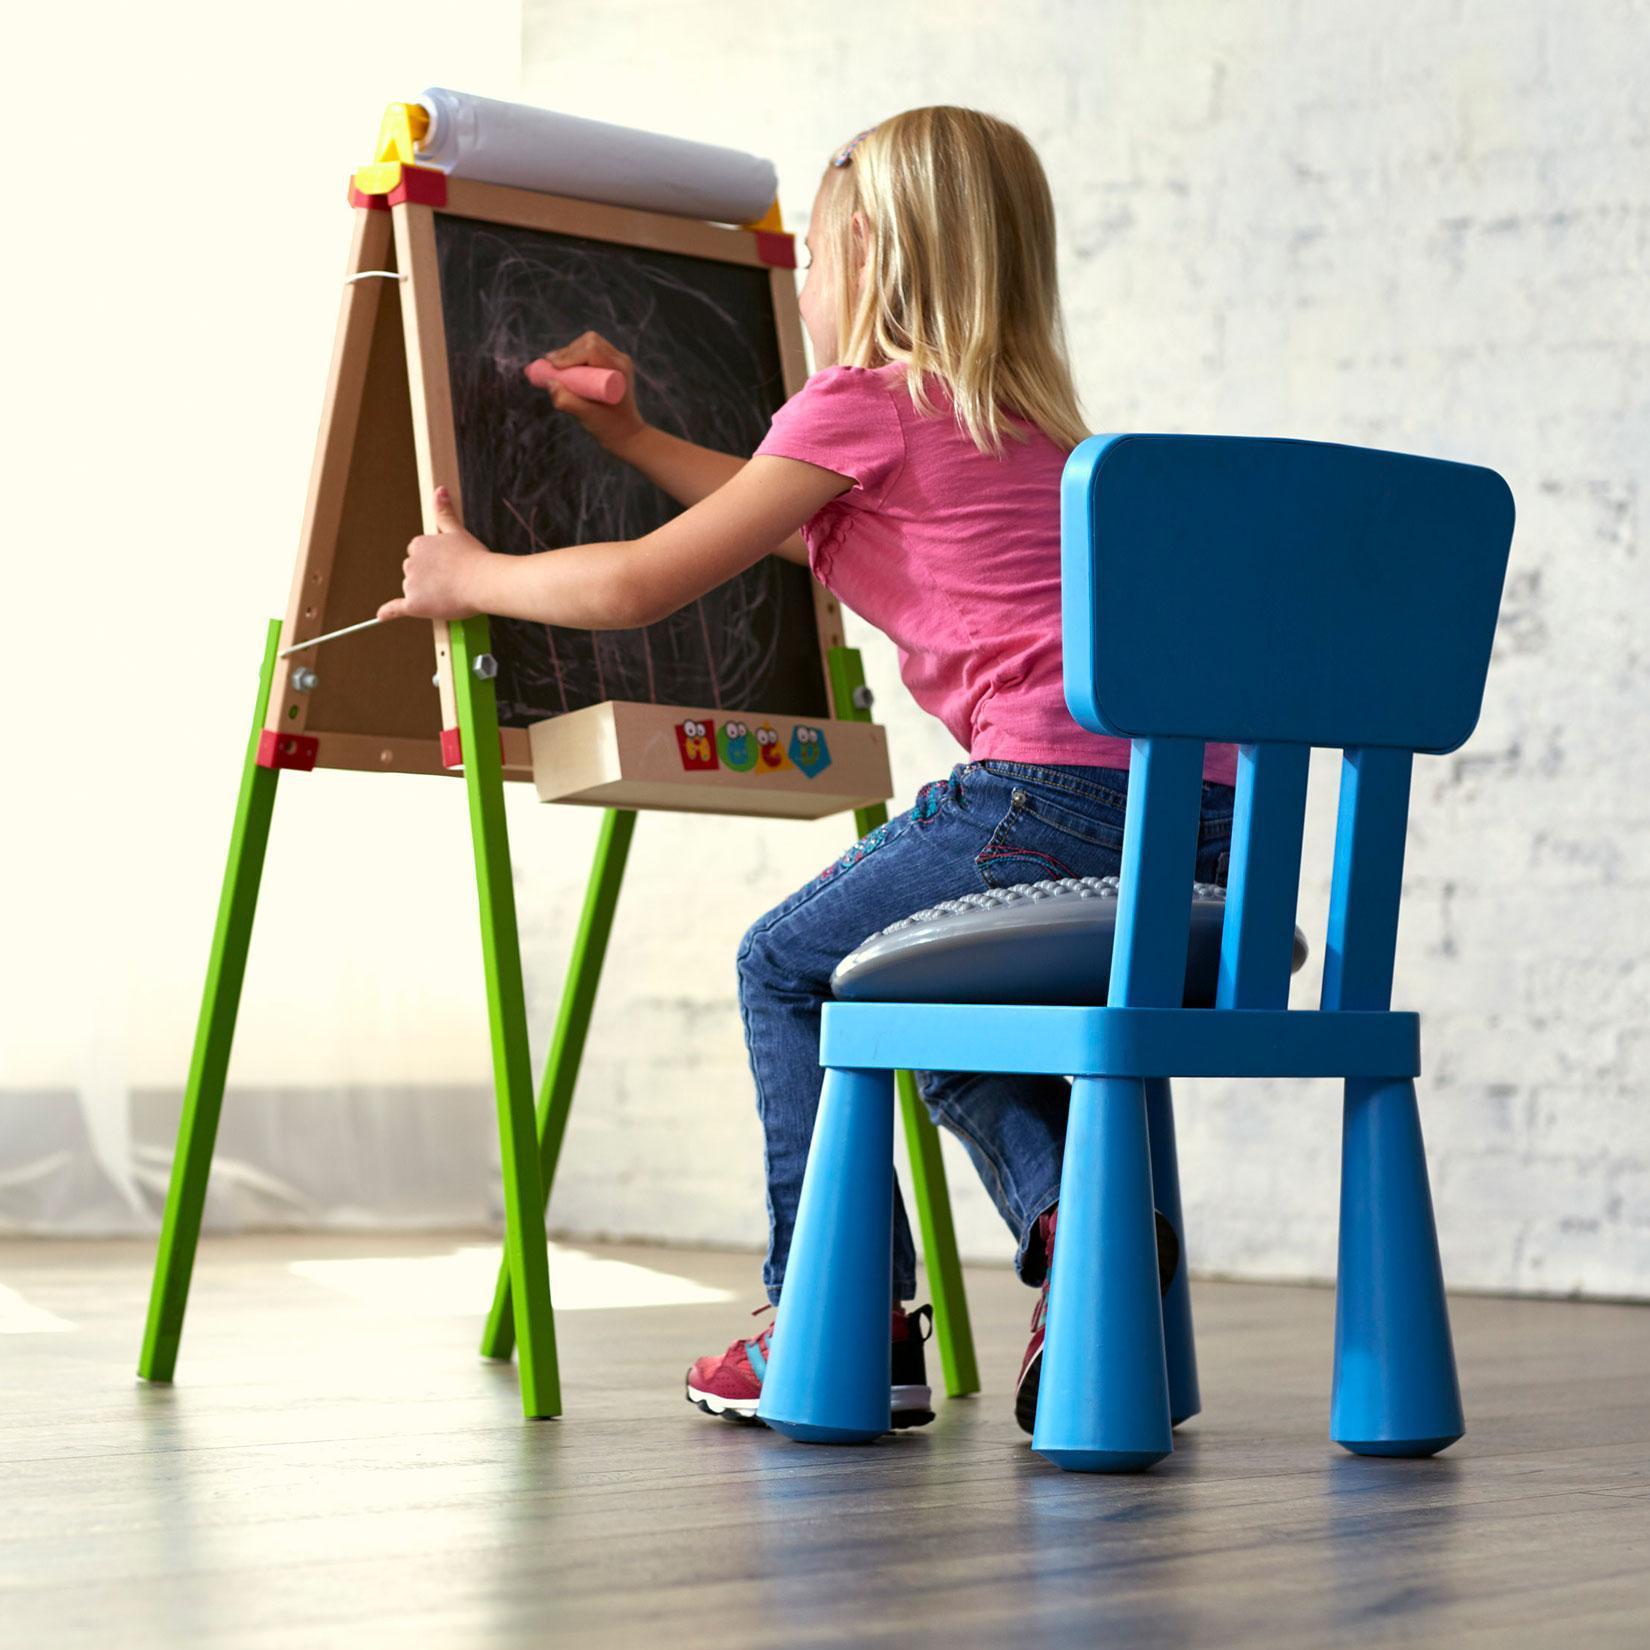 Gaiam Balance Ball Chair Inflation: Buy Gaiam Kids Balance Cushion, Inflatable Wobble Disk